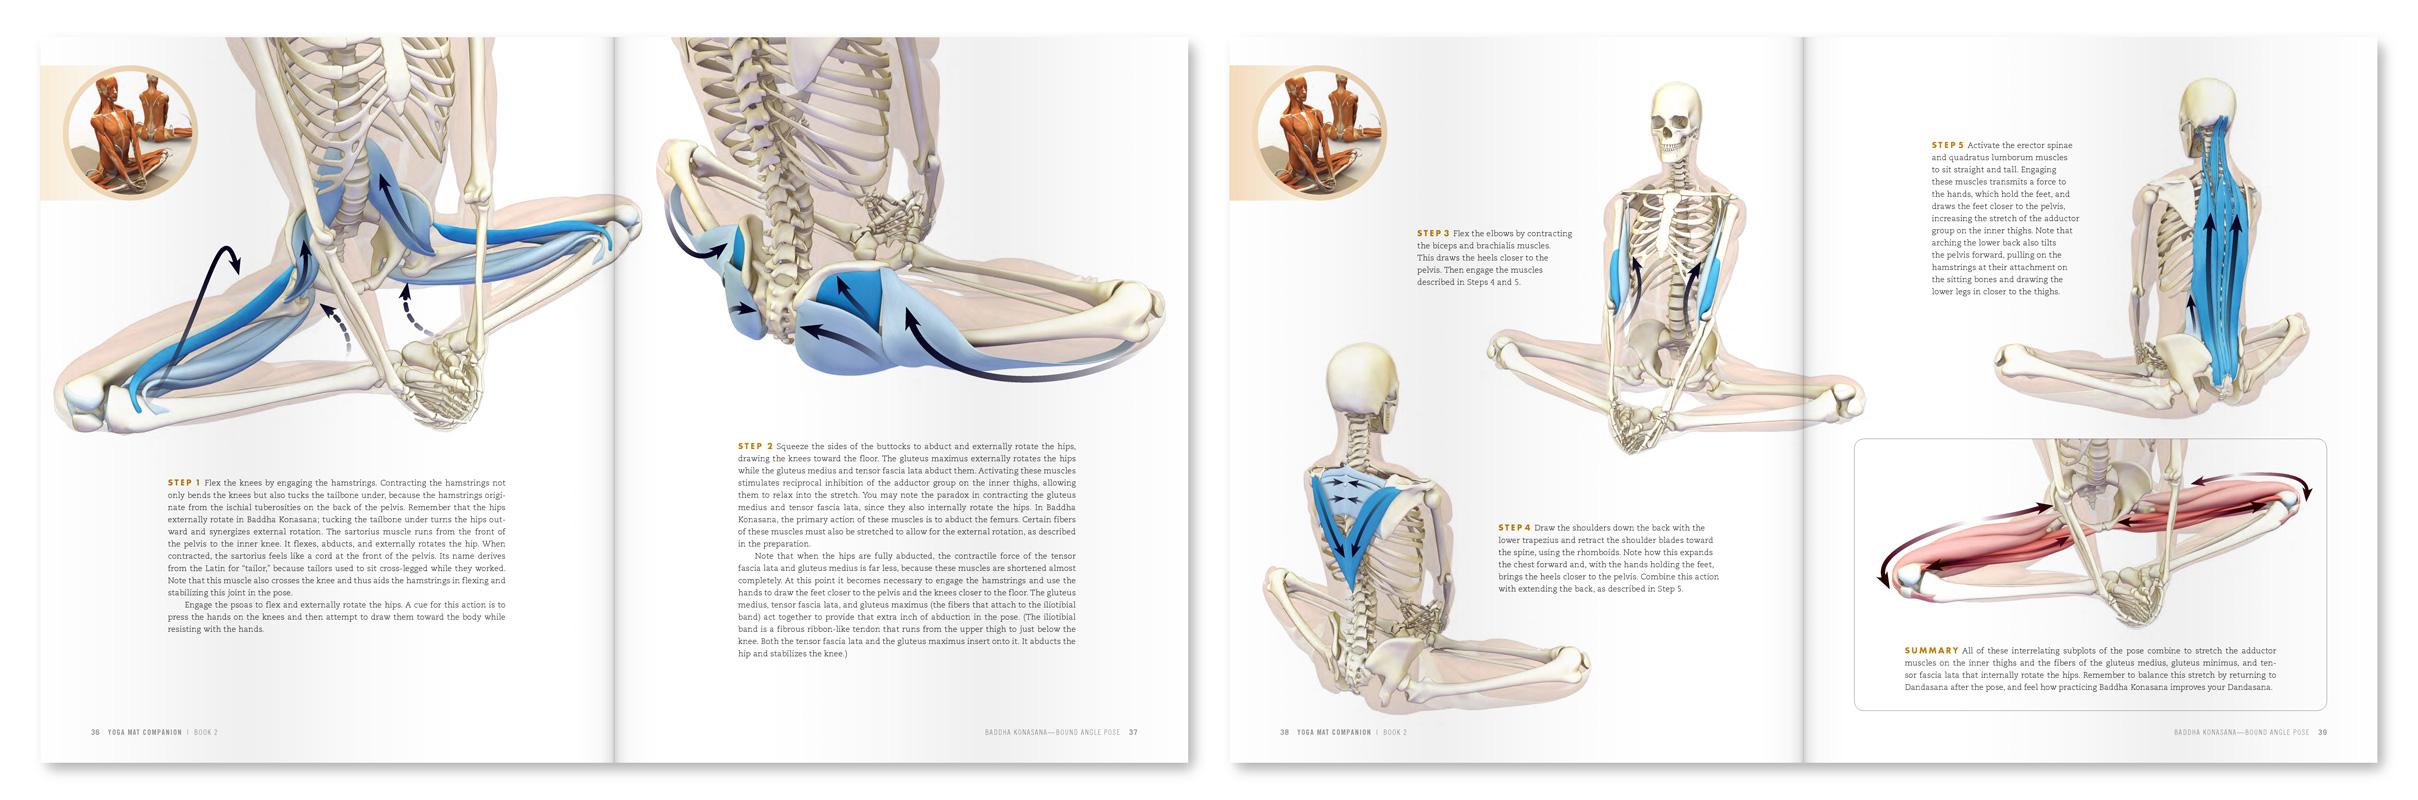 Image result for baddha konasana anatomy